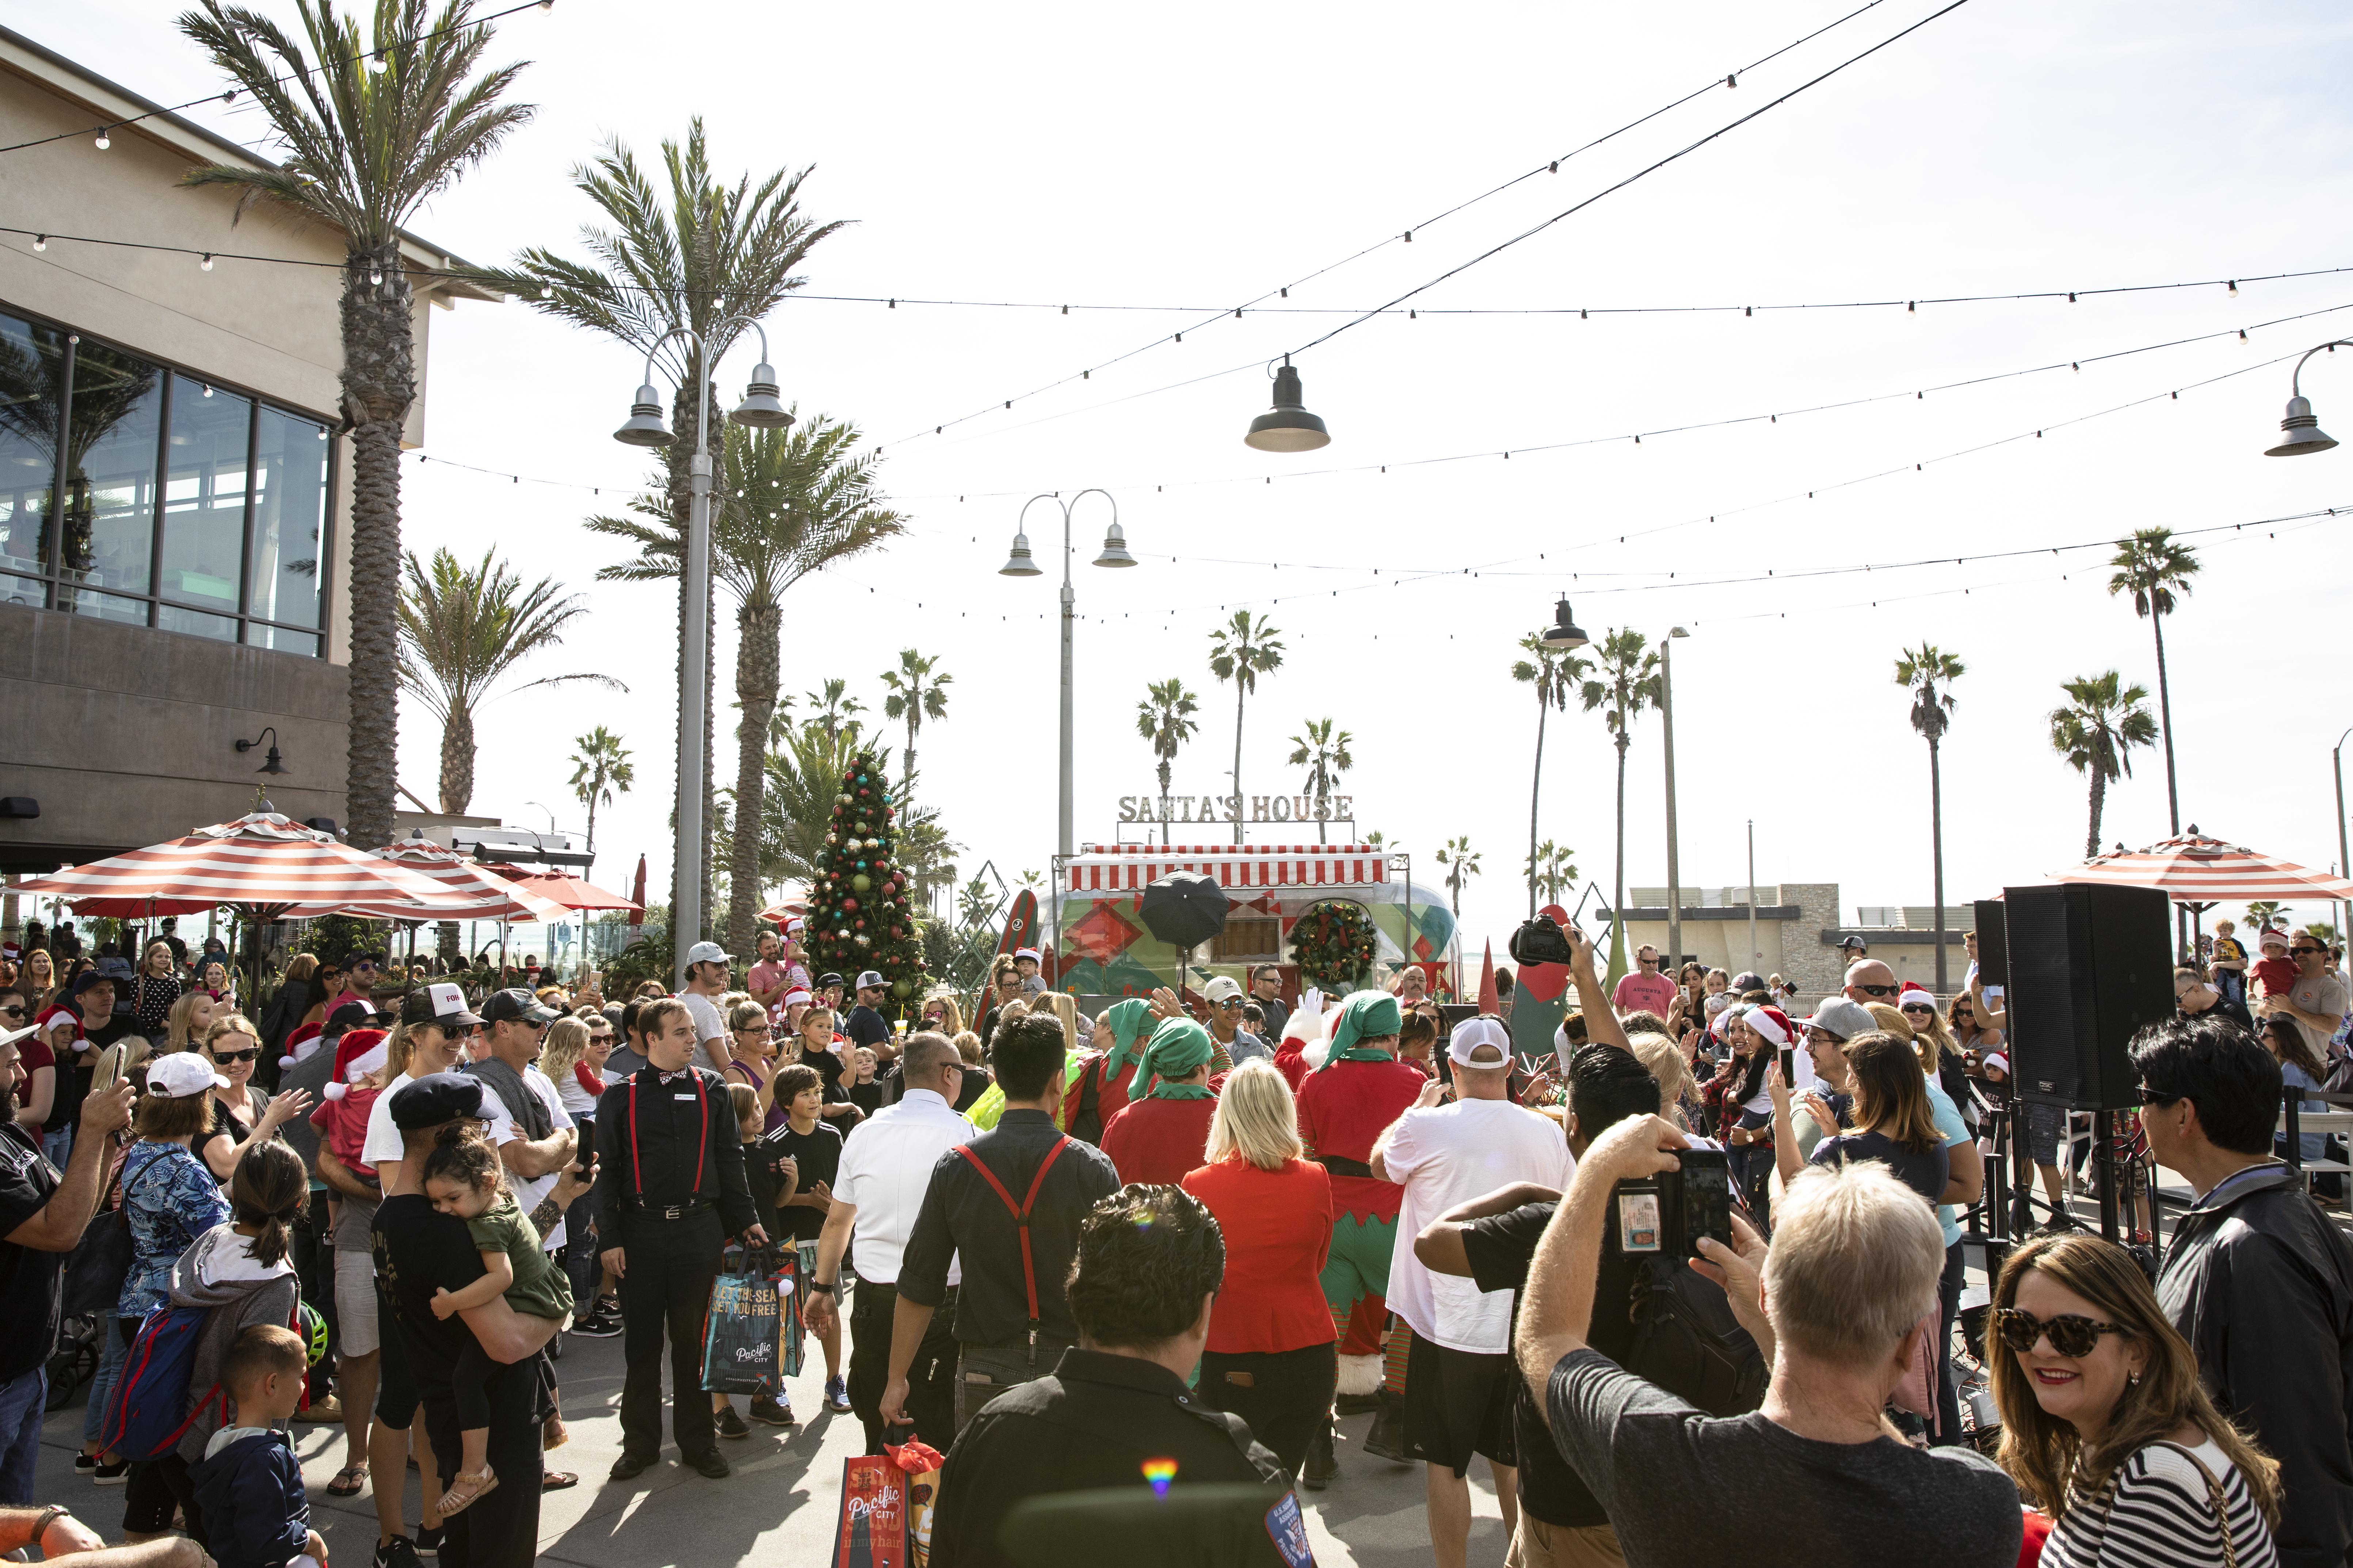 Huntington Beach Events | Concerts, Festivals, And Community Within Huntington Beach Fireworks Calendar